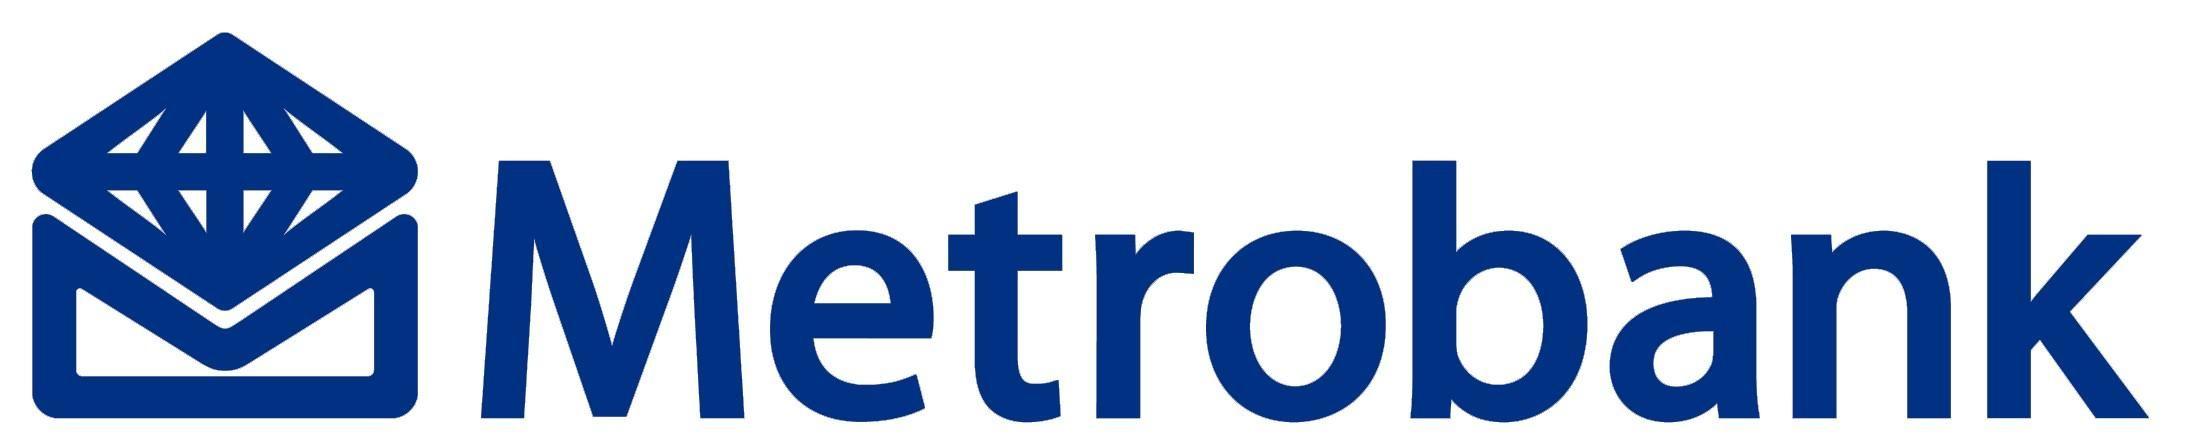 Metrobank Minimotors Installment Credit Card 0 Interest